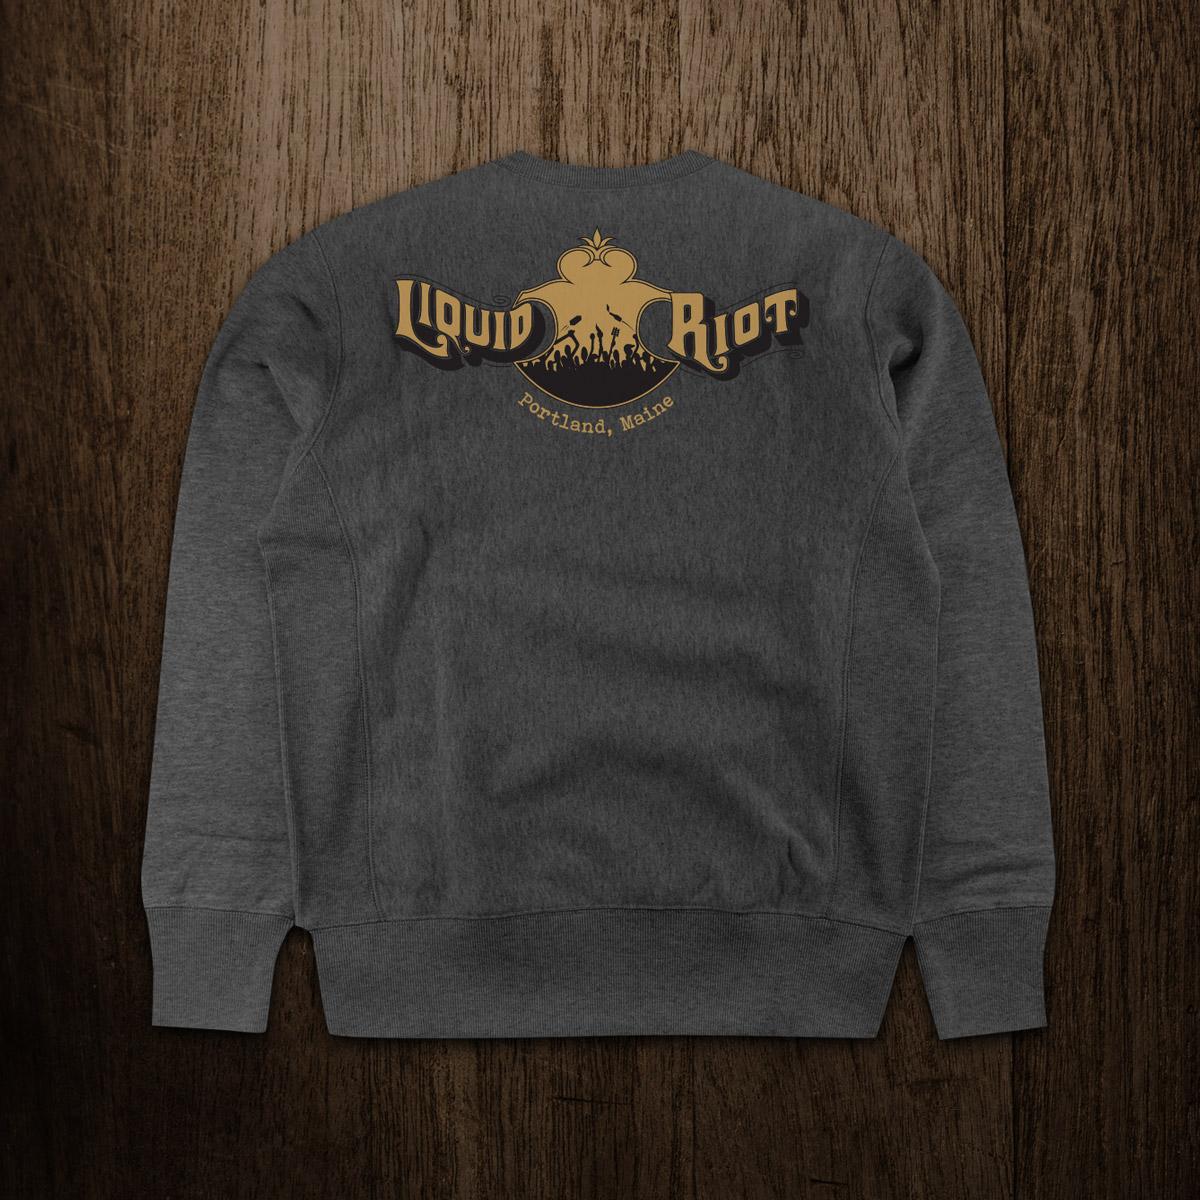 Liquid Riot Sweatshirt